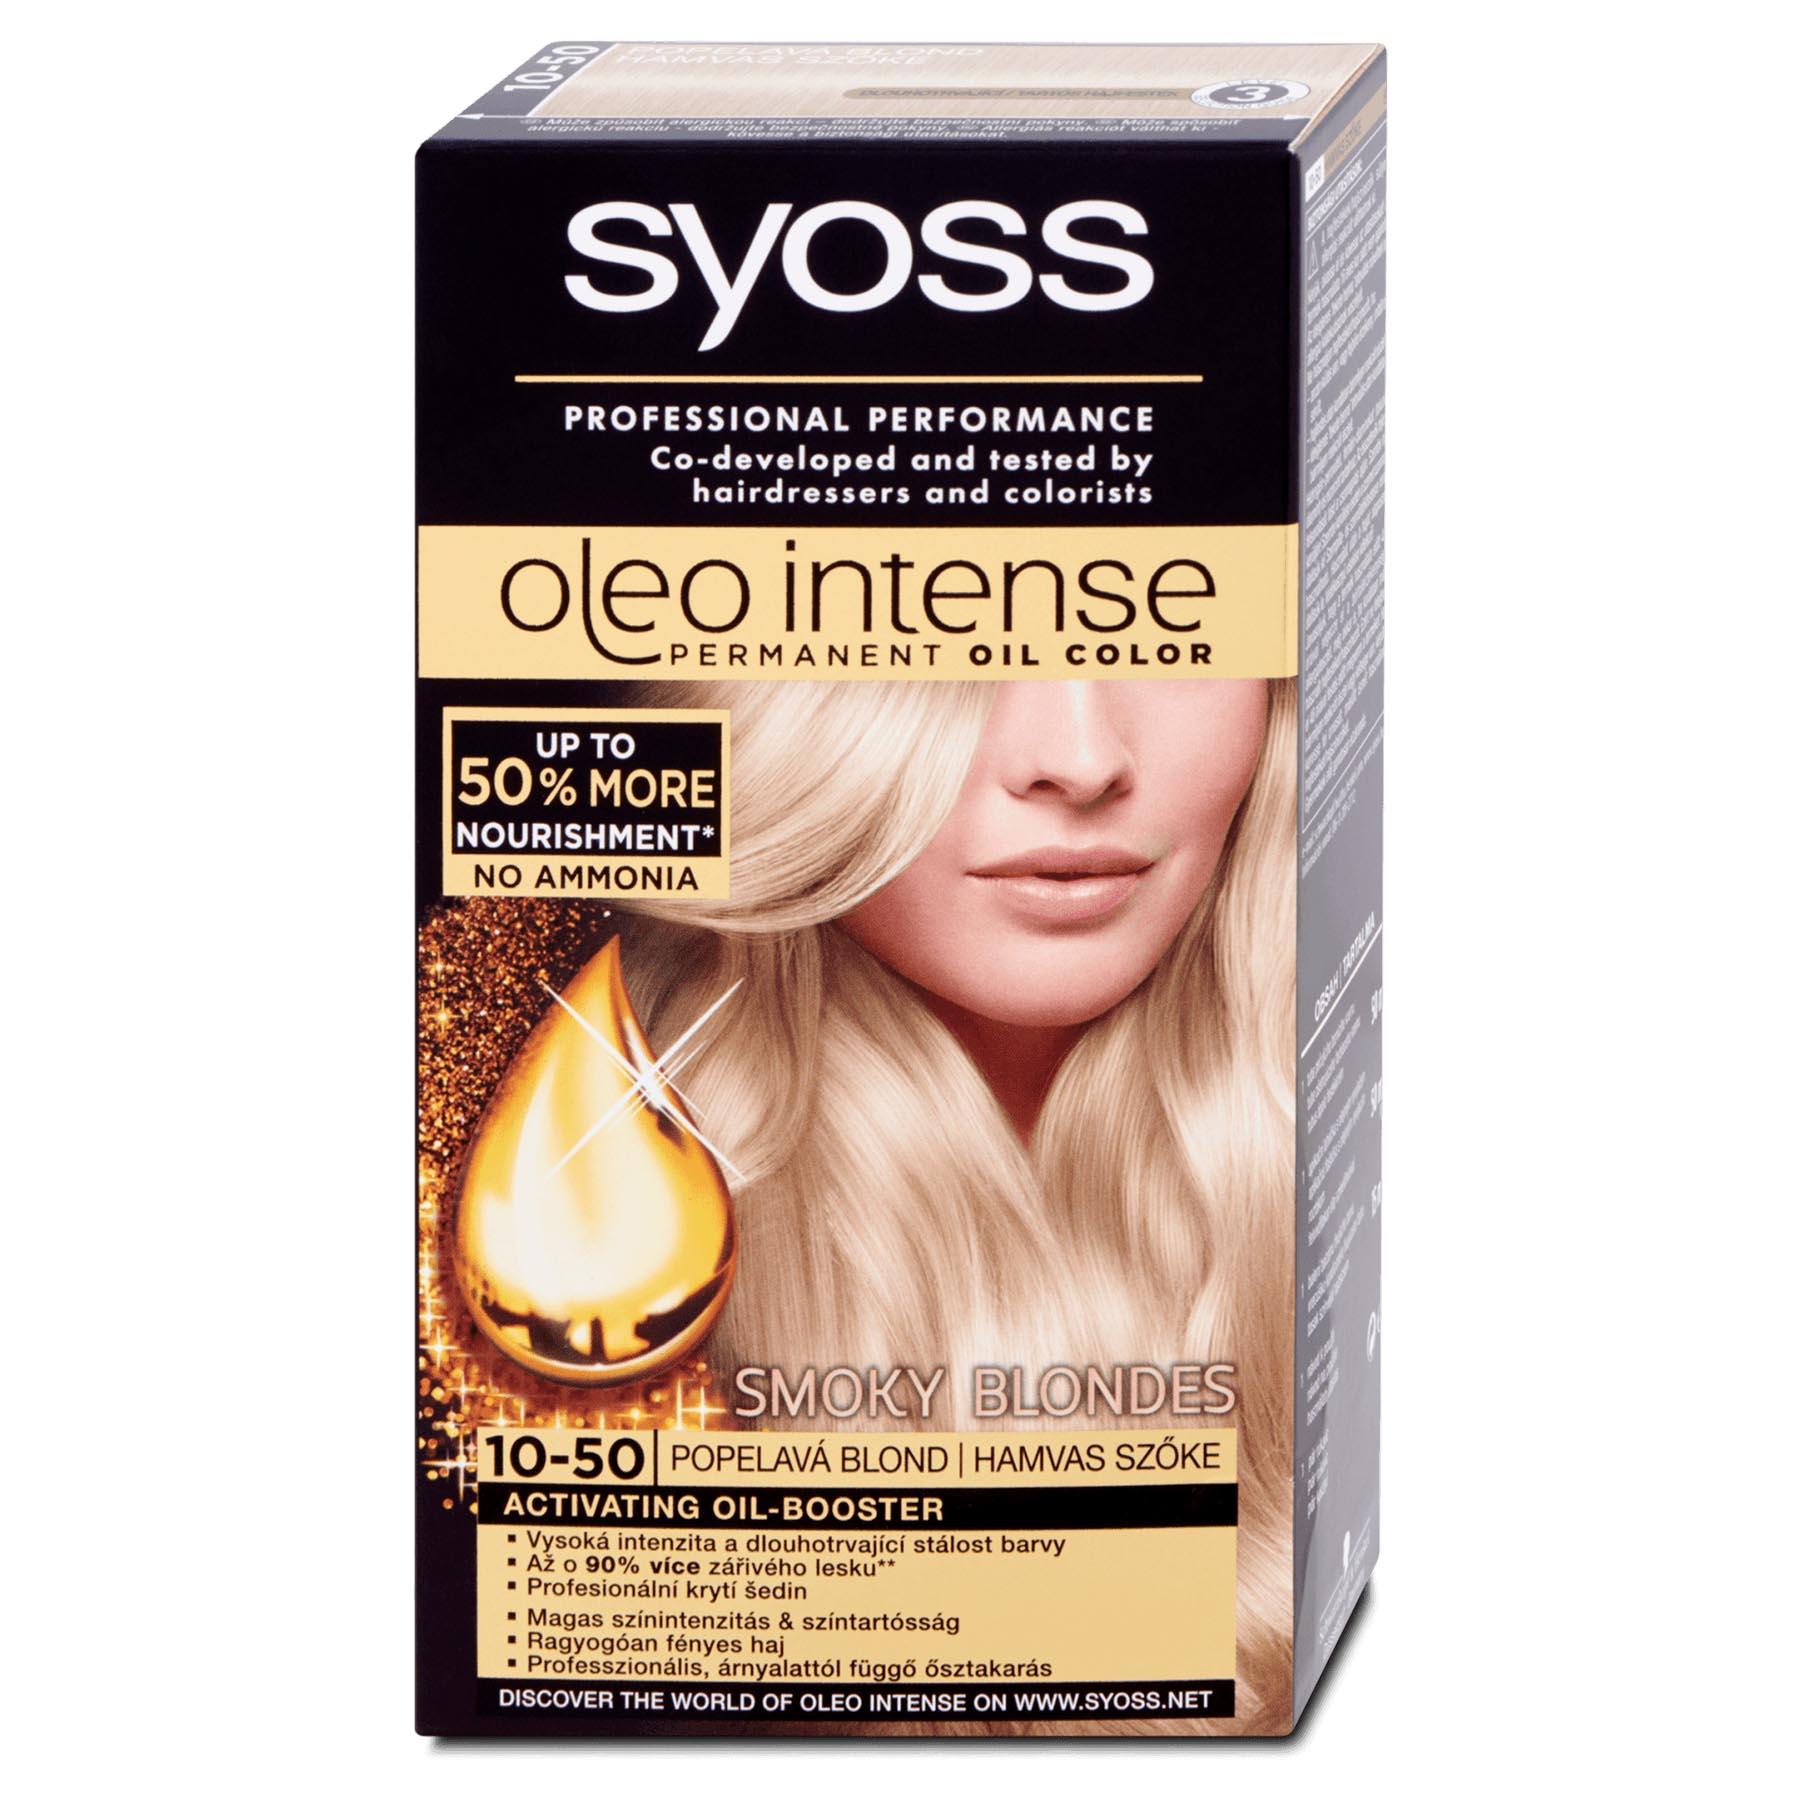 Syoss Oleo Intense Permanent 10-50 Ashy Blonde Hair Oil Color ... dba620ceb8e